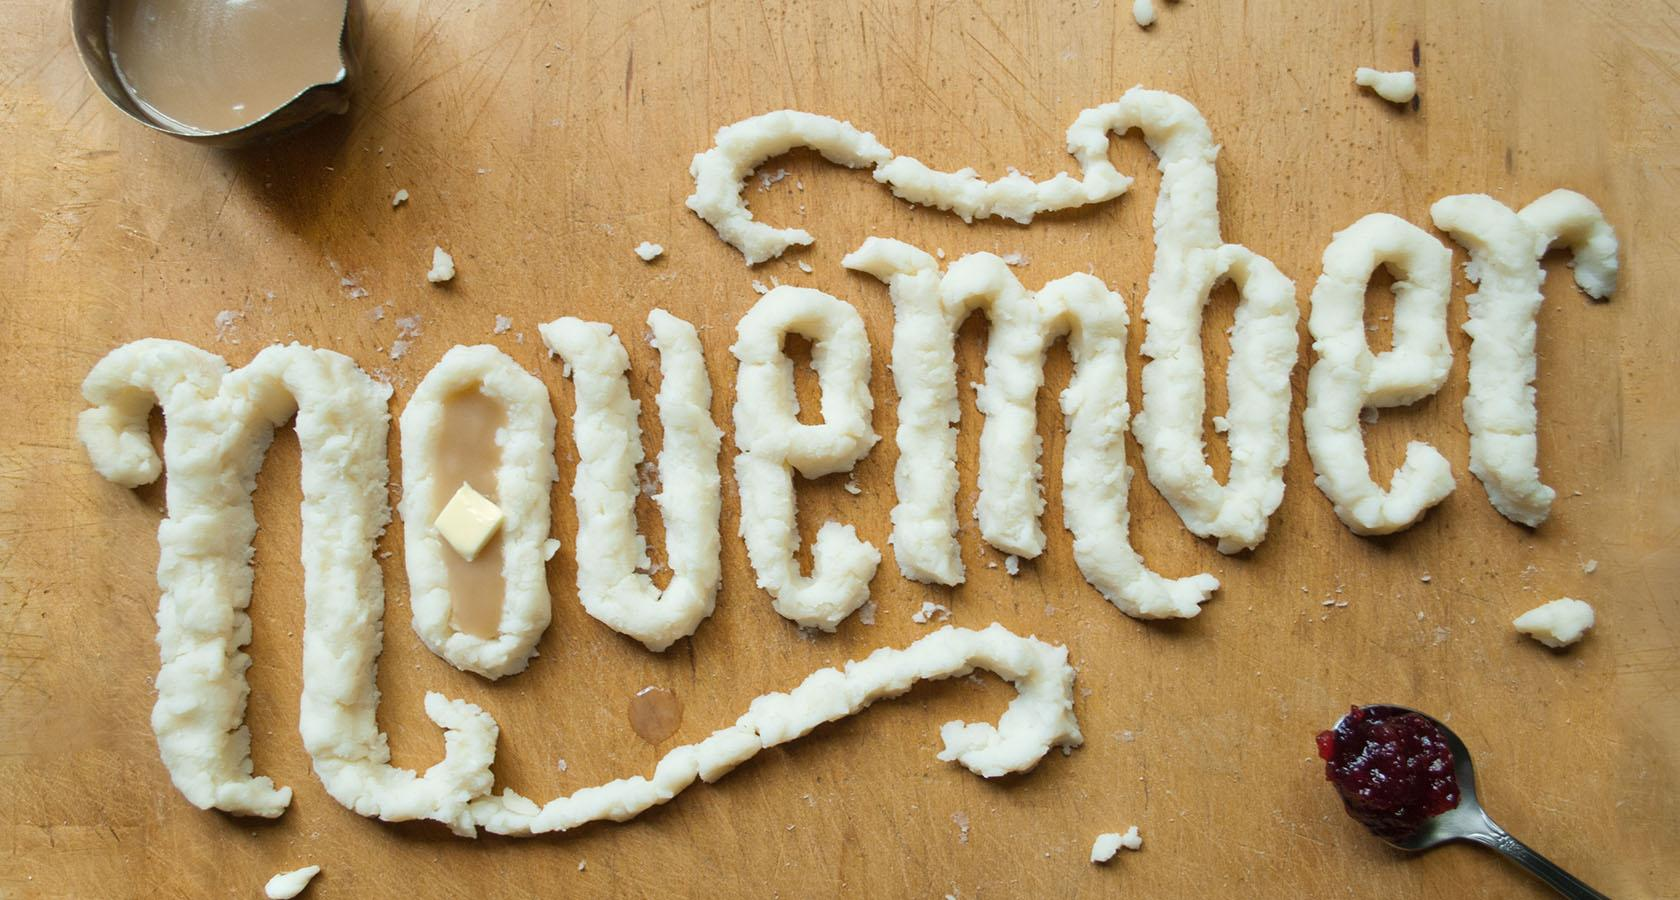 danielle evans food lettering